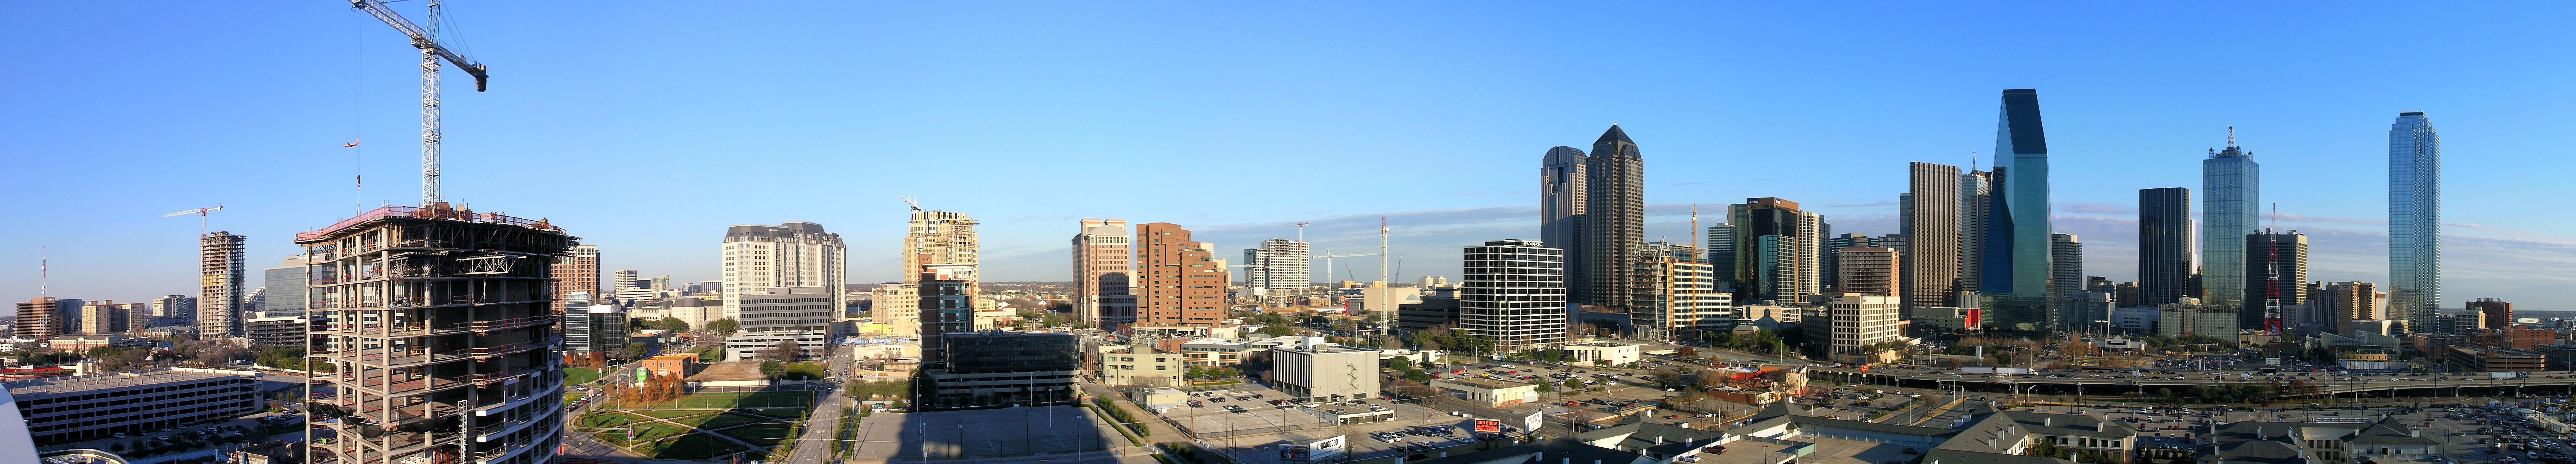 Description Dallas, Texas Skyline 2006.jpg